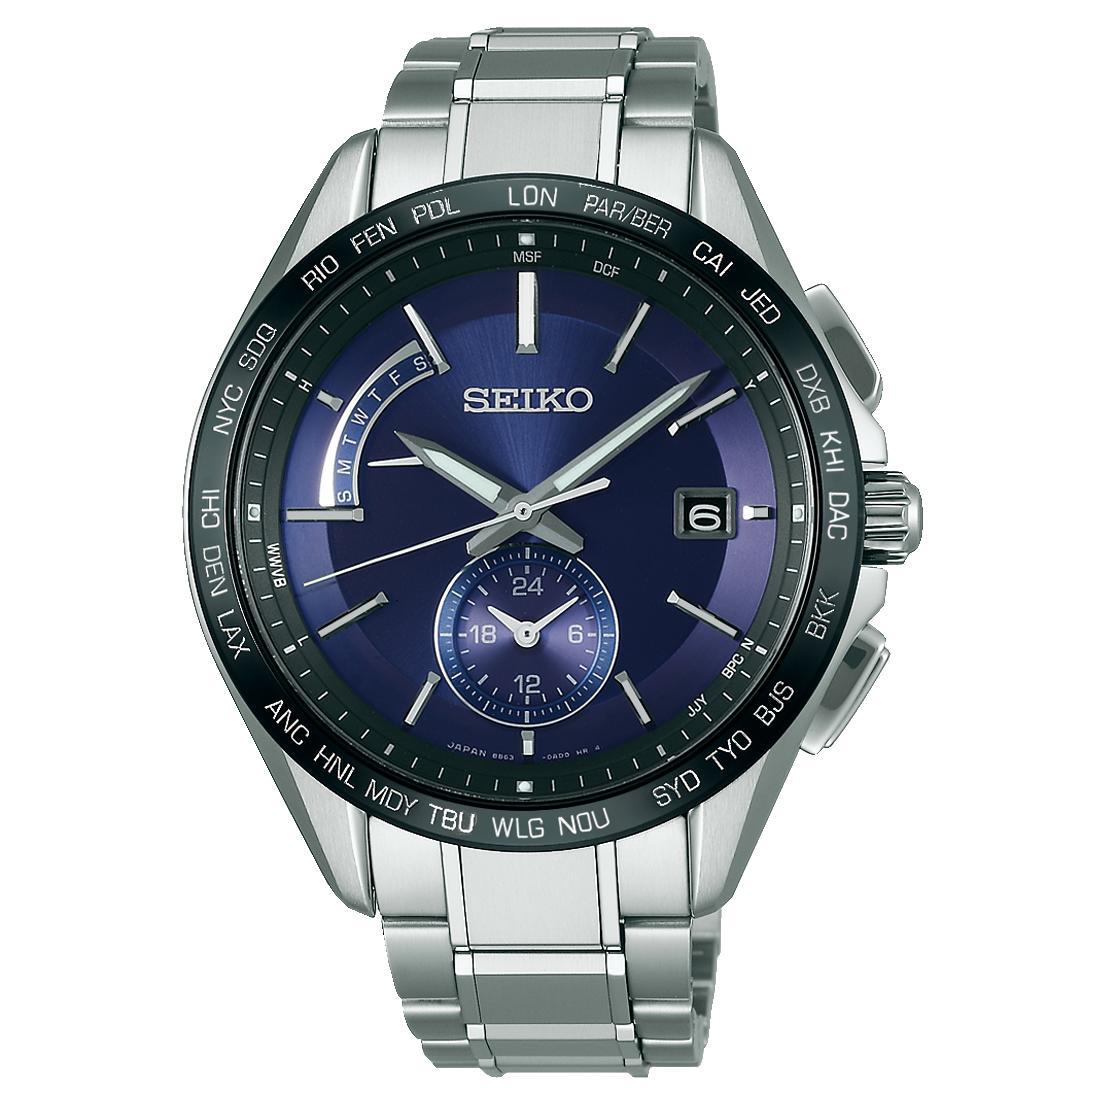 SEIKO セイコー BRIGHTZ ブライツSAGA231 ソーラー電波時計【正規販売店】